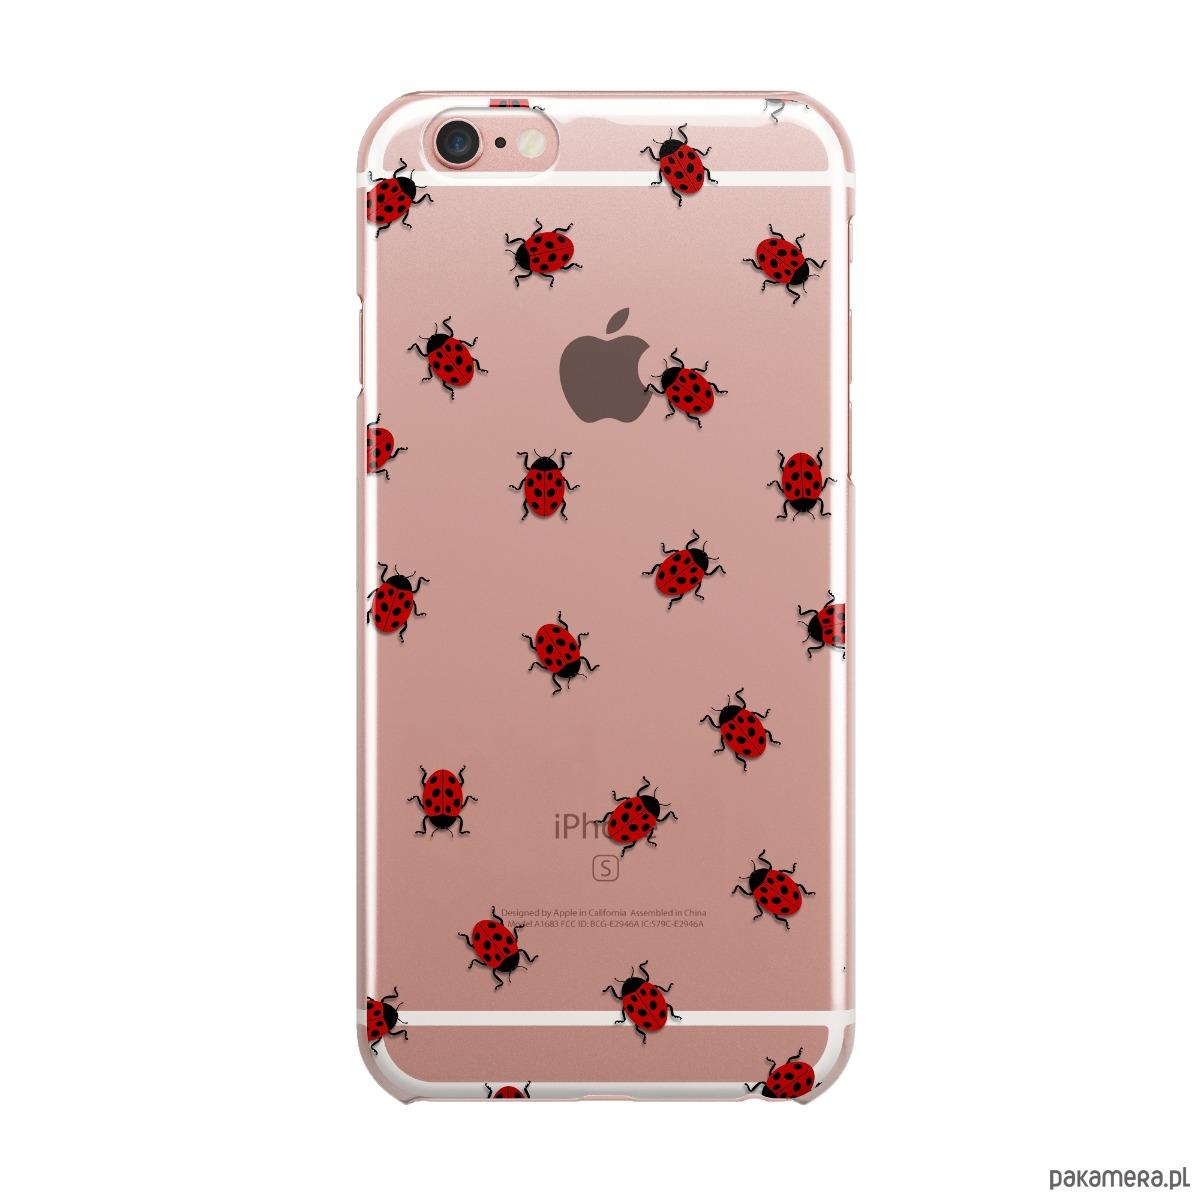 Biedronki Iphone Case Etui Silikonowe Obudowa Pakamerapl